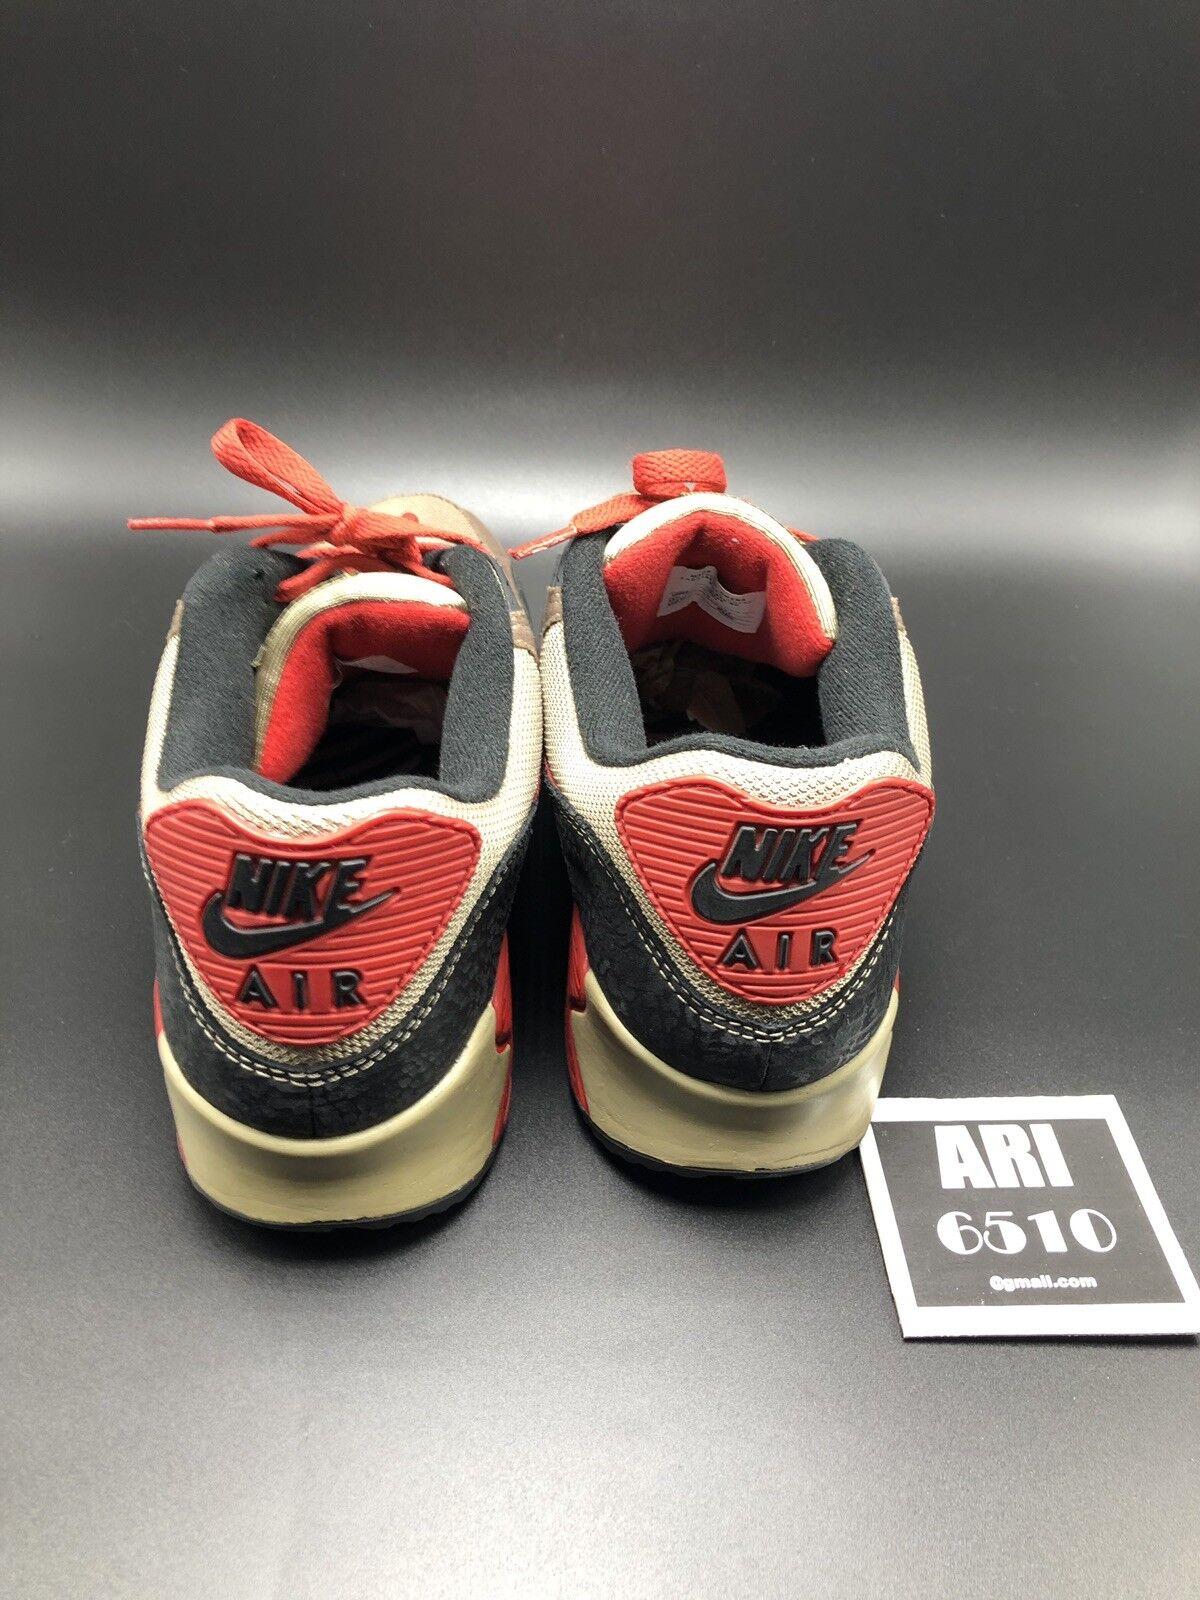 Nike Air Max 90 ID ID ID 1  1 Rare Cement Elephant Print 11 Jordan Dunk Supreme Tokyo 0eb021